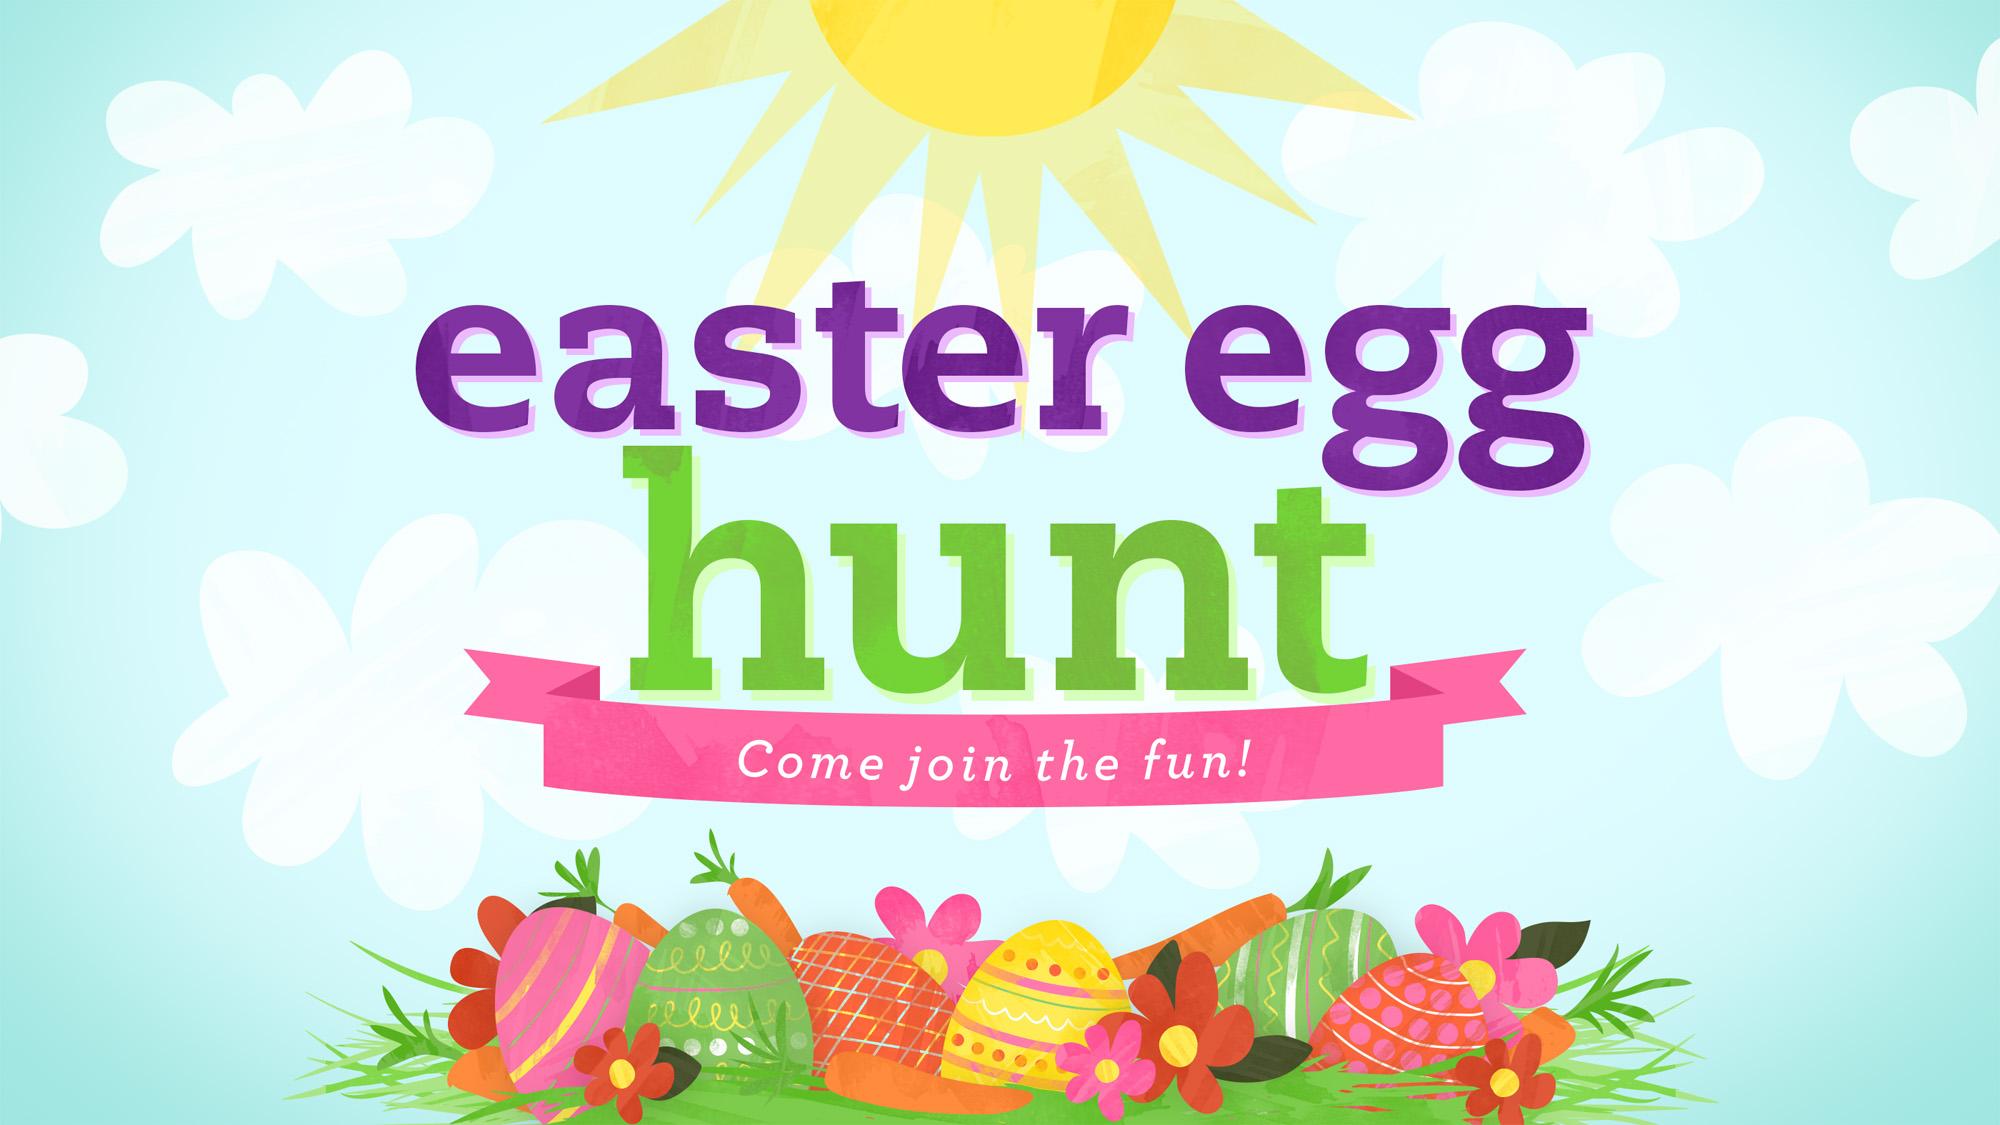 Sensen clipart easter egg hunt Hunt easter egg collections Egg